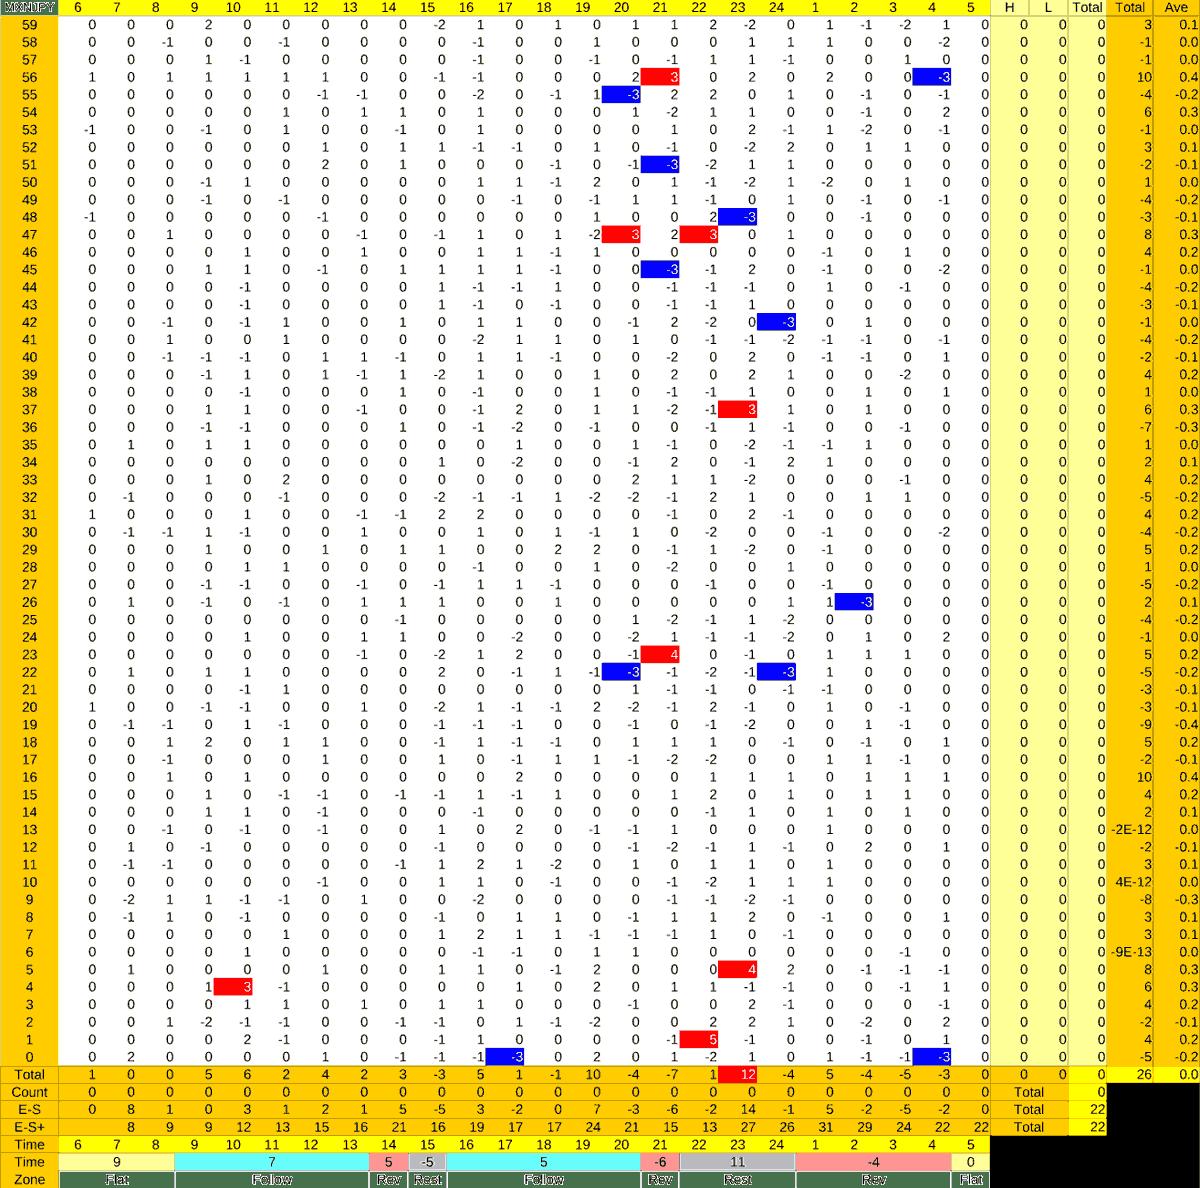 20210416_HS(3)MXNJPY